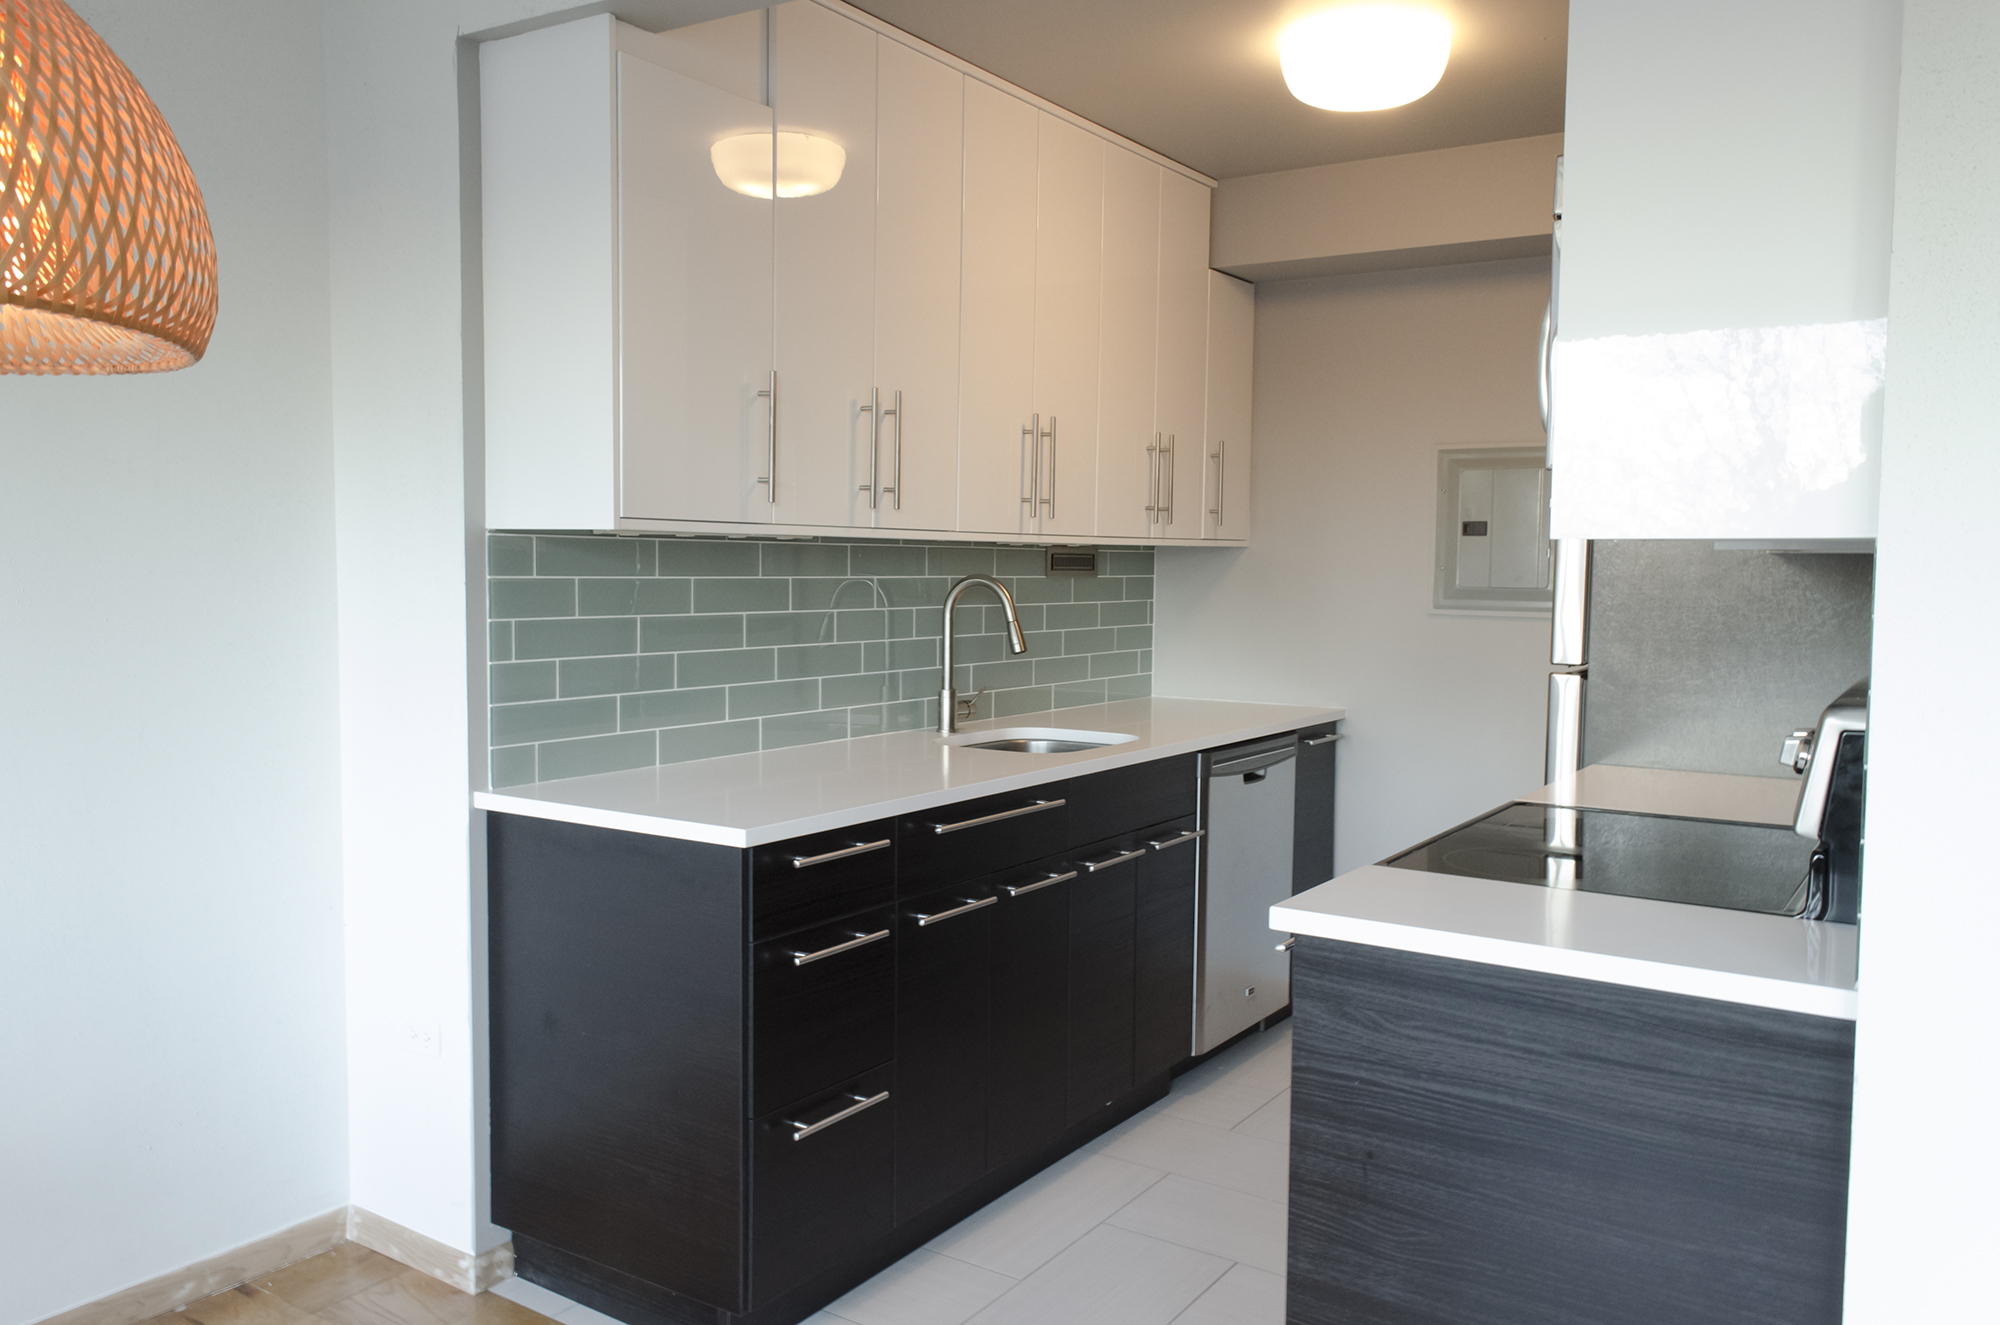 Colored small kitchen appliances Photo - 8